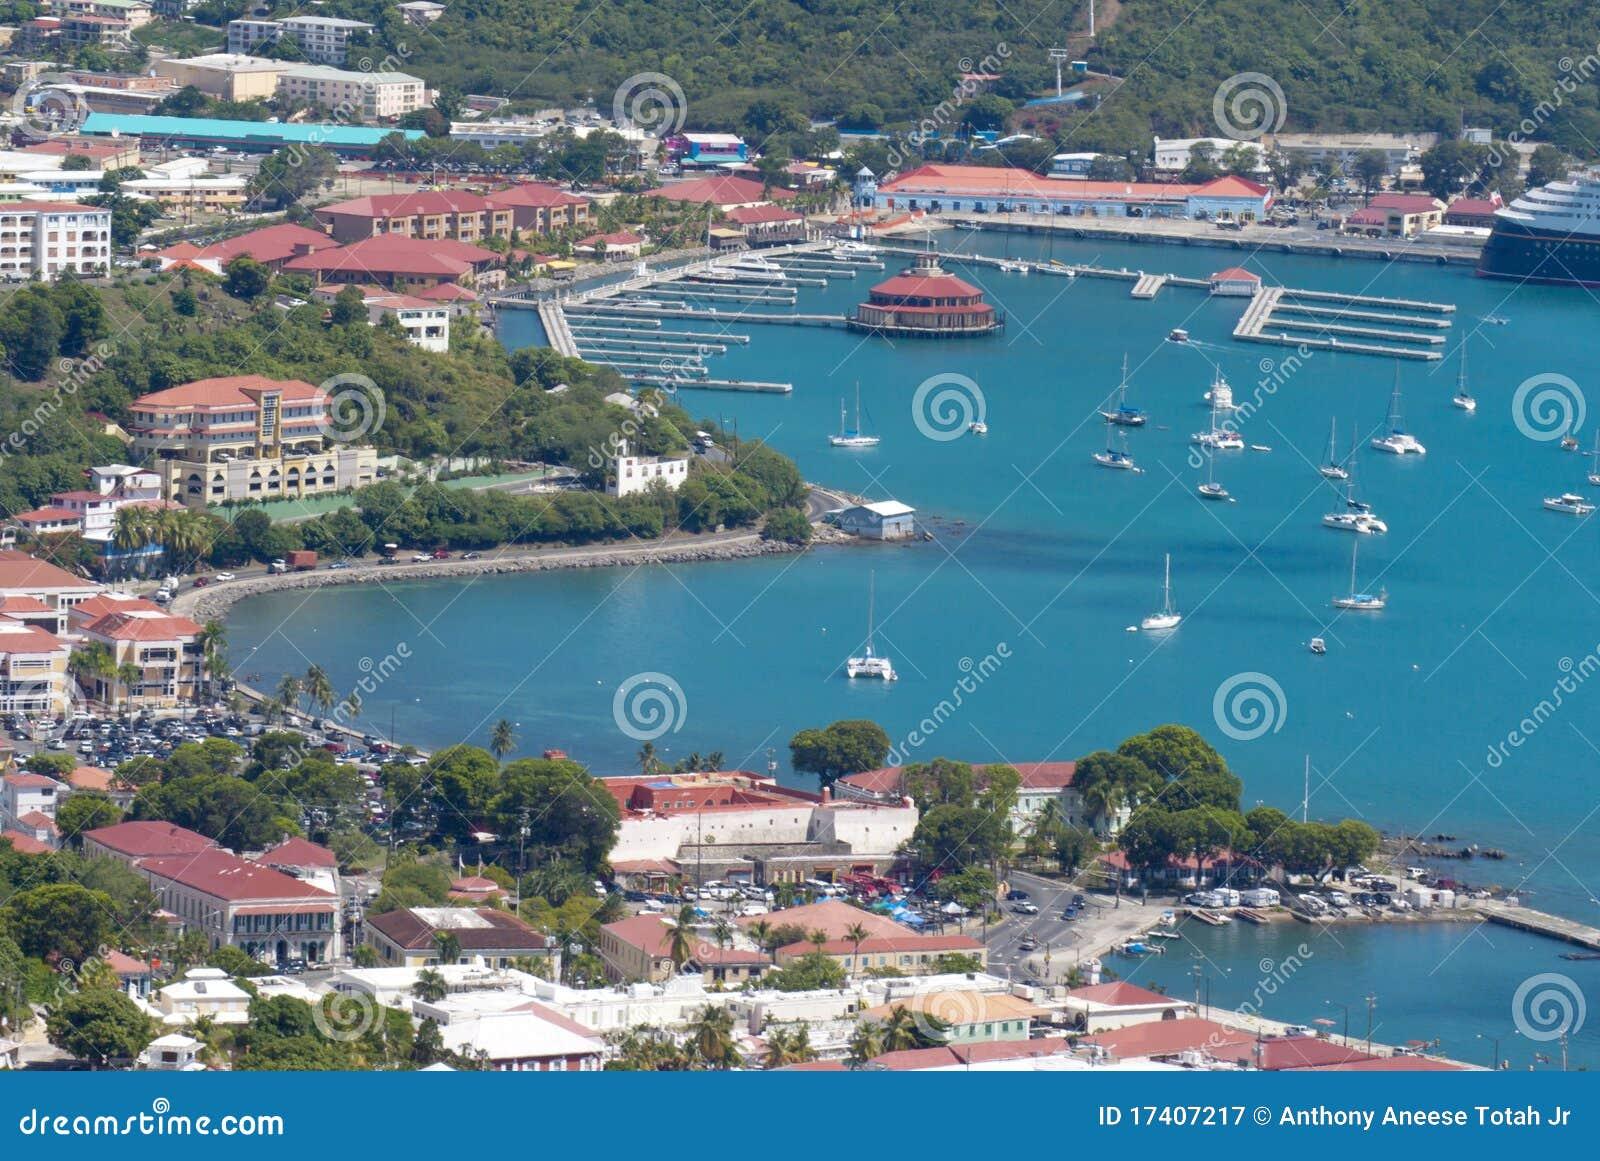 Charlotte Amalie, rue Thomas, USVI